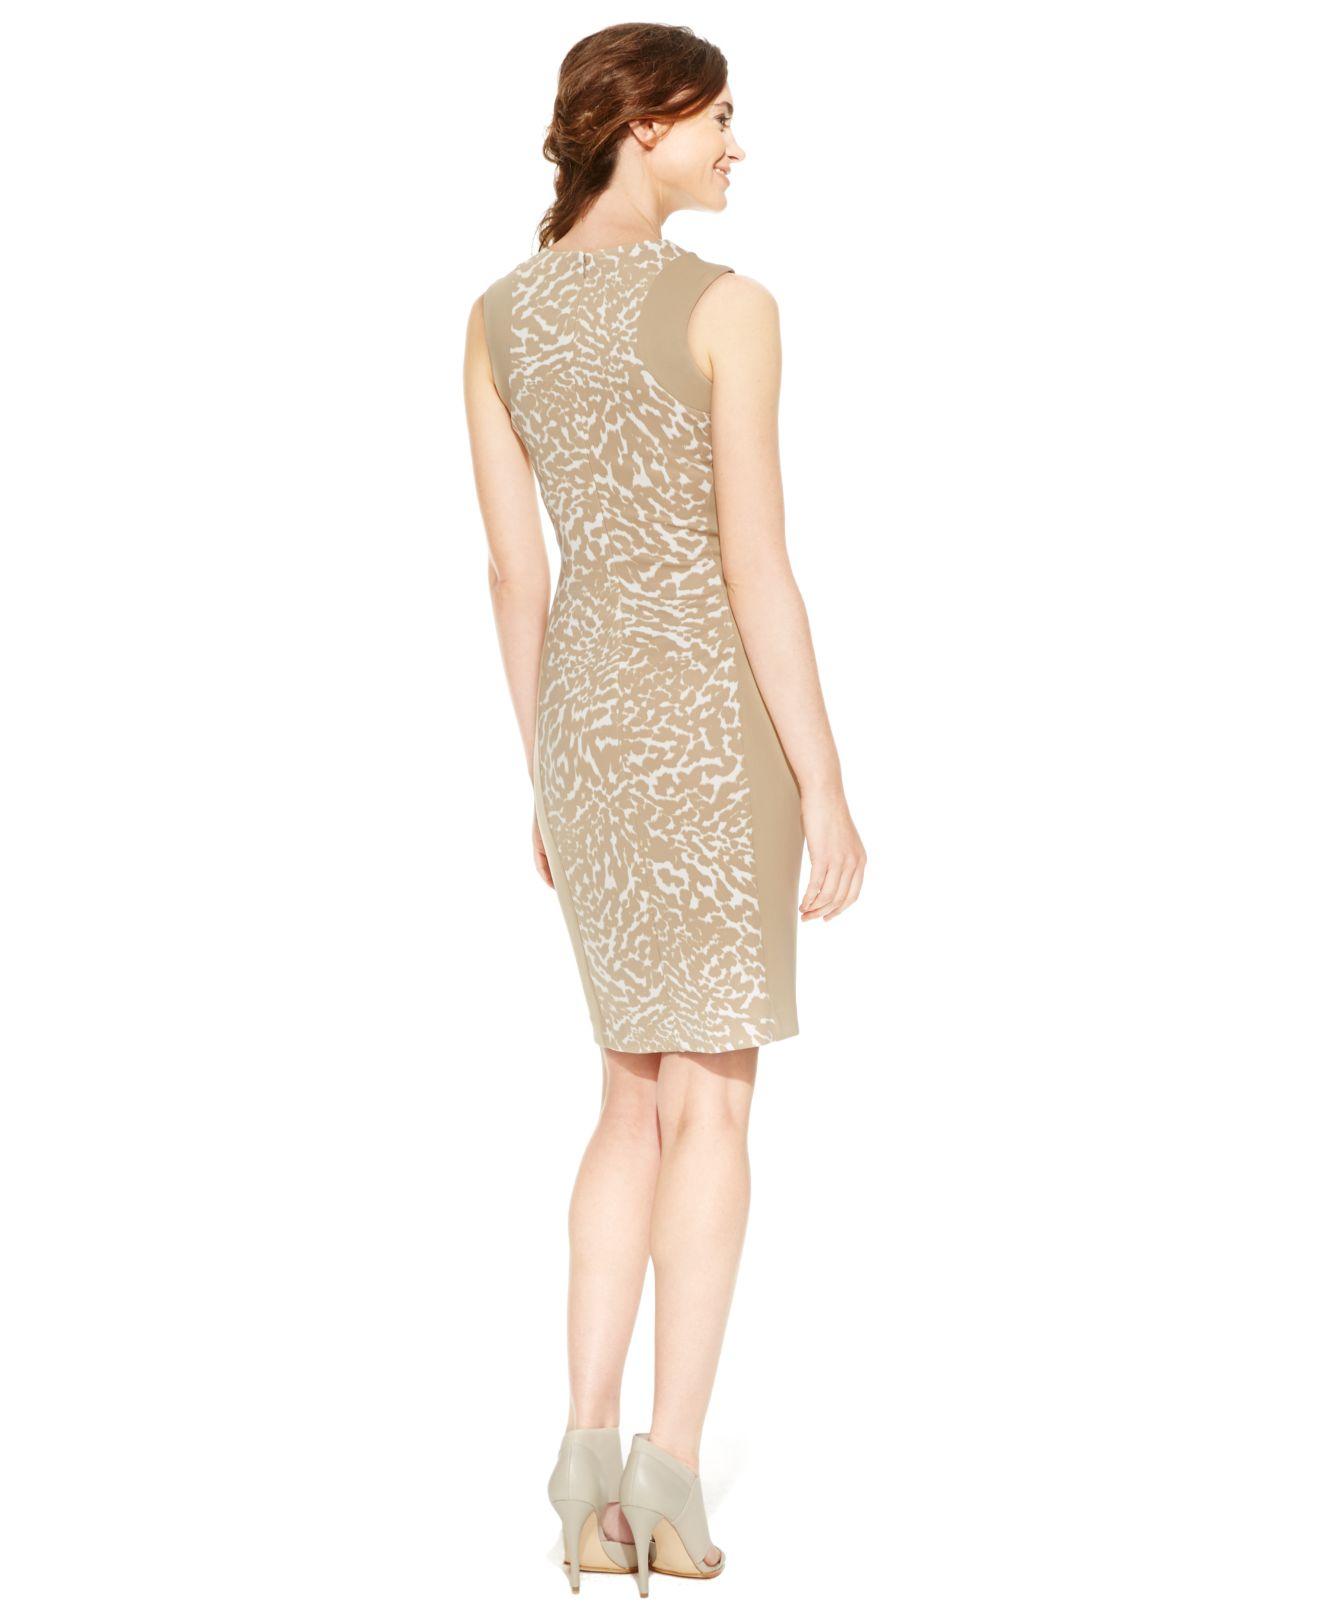 Lyst - Calvin Klein Scuba Animal-Print Sheath Dress in Natural d0f5898db